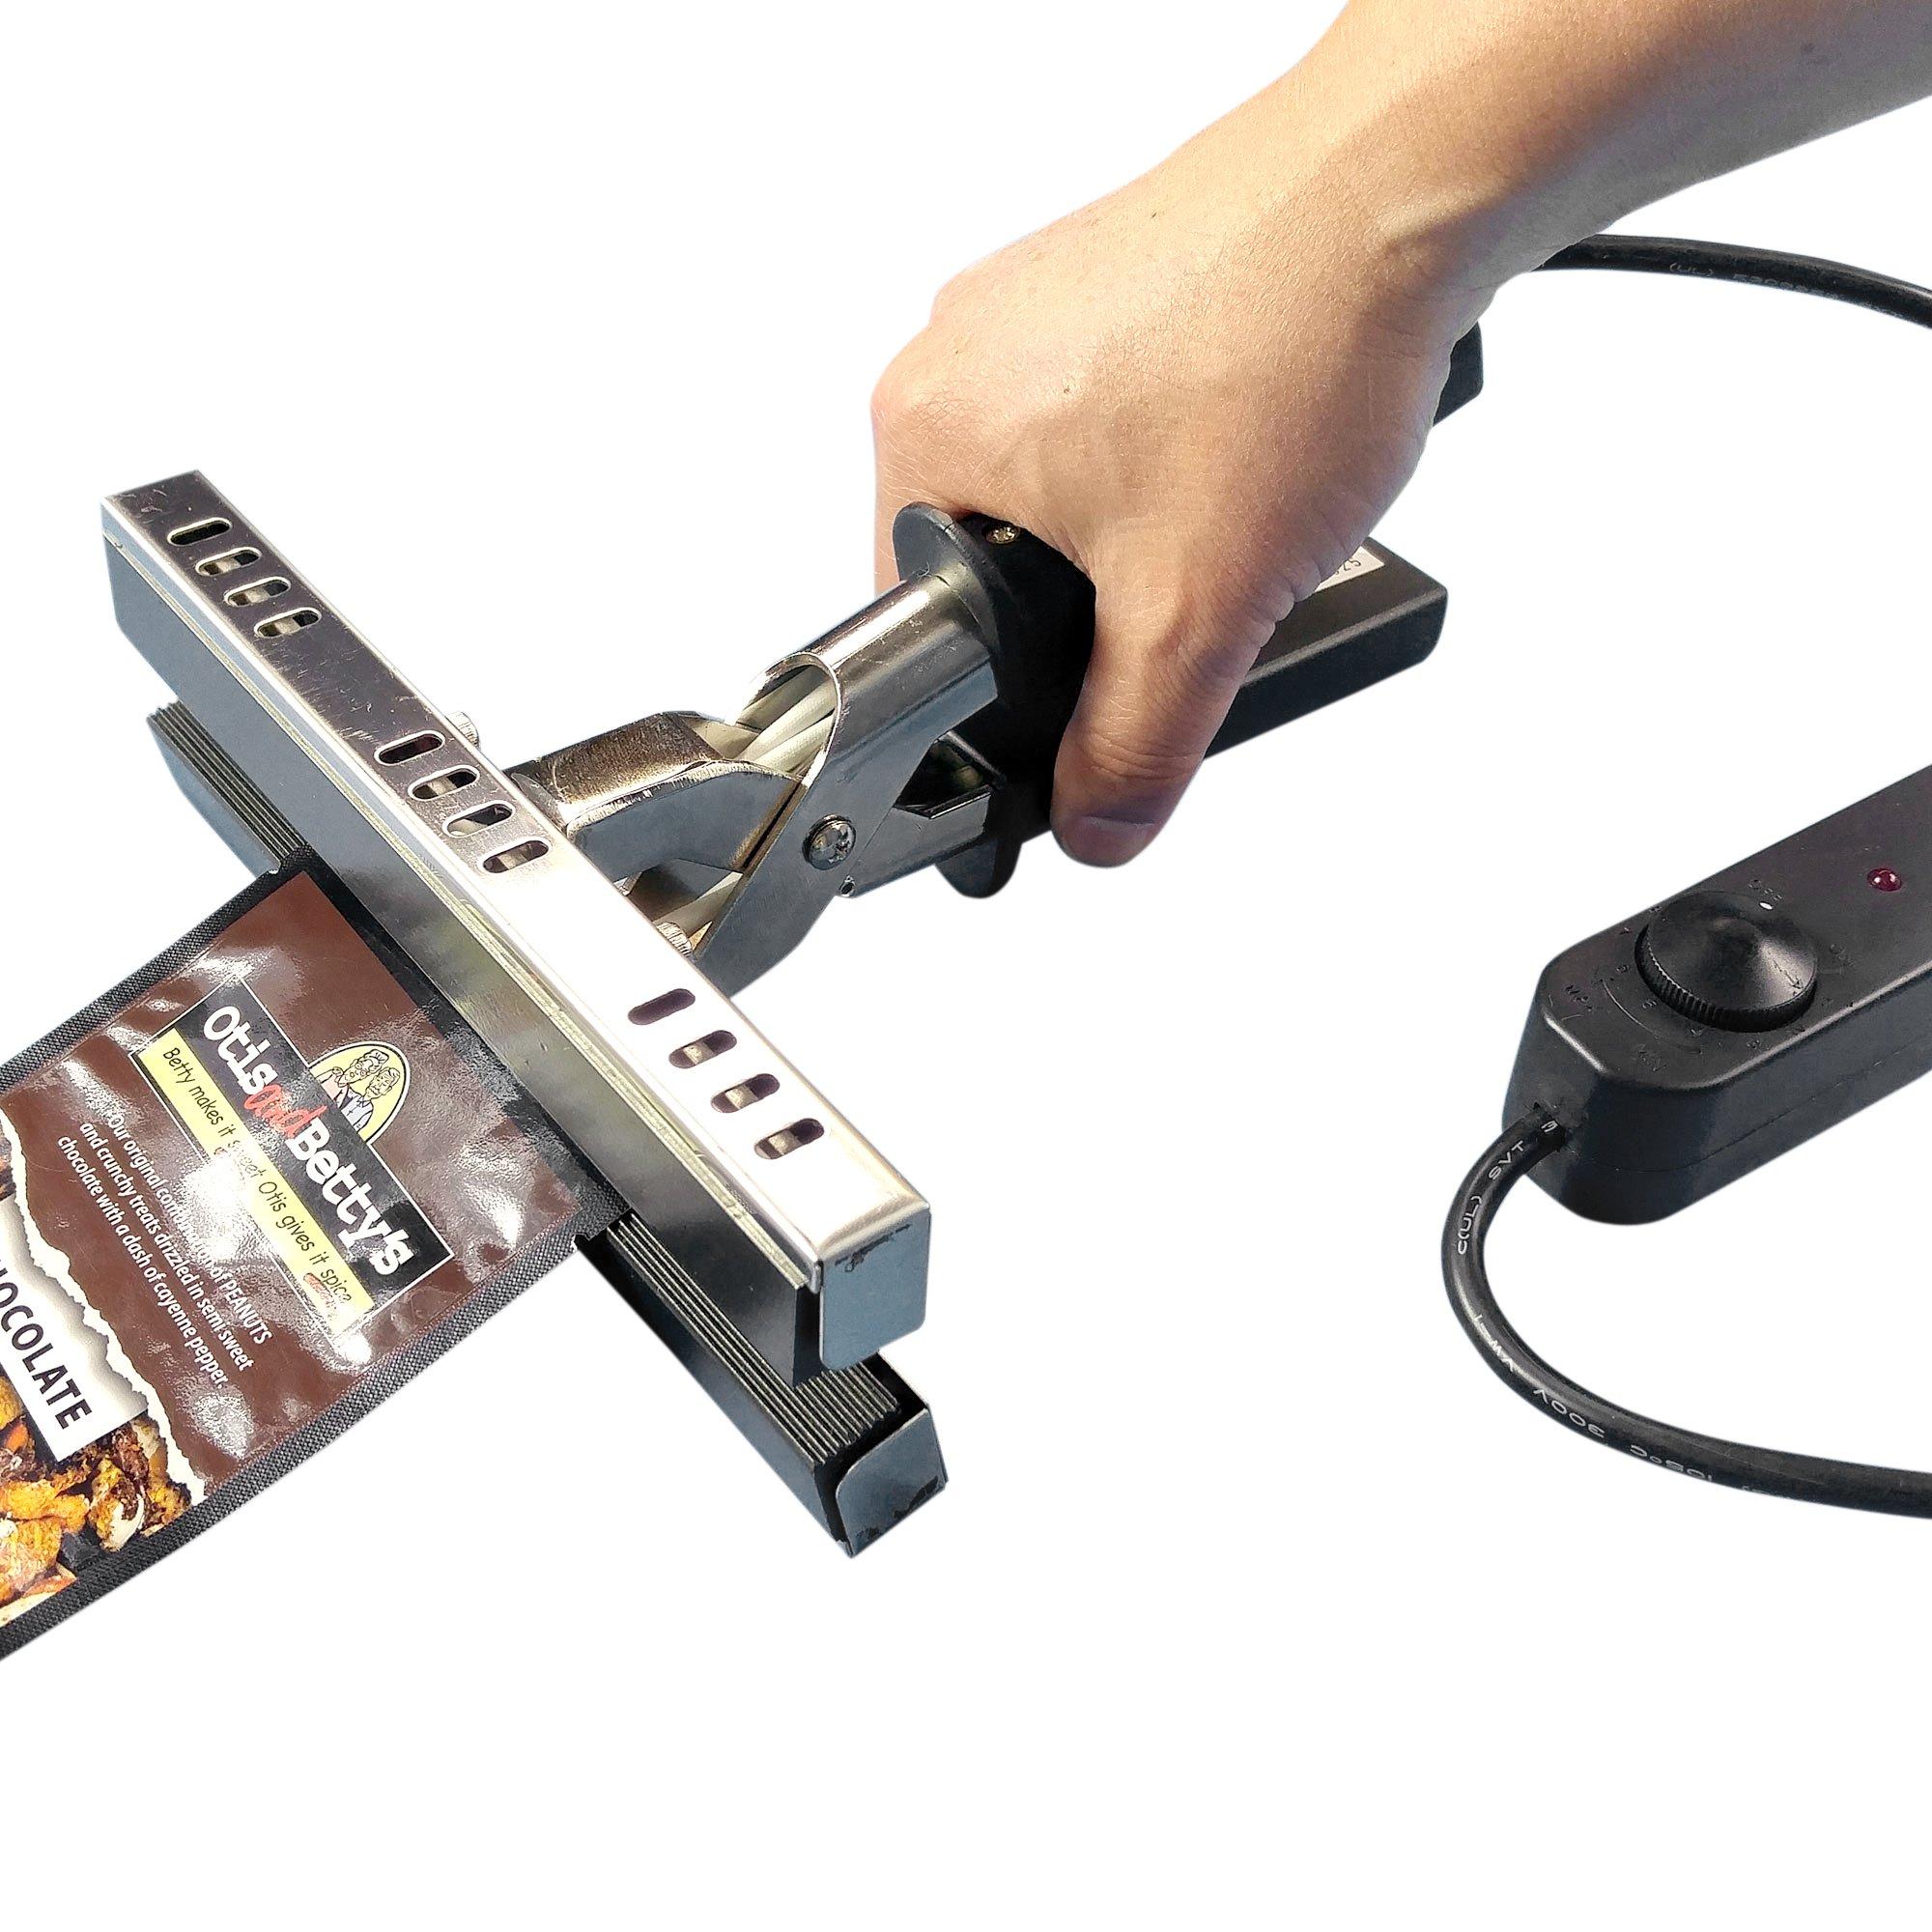 8'' Mylar Bag Heat Sealer KF-200CS, 110V/120W, Adjustable Temp., for Sealing Foil Kraft Coffee Storage Pouches